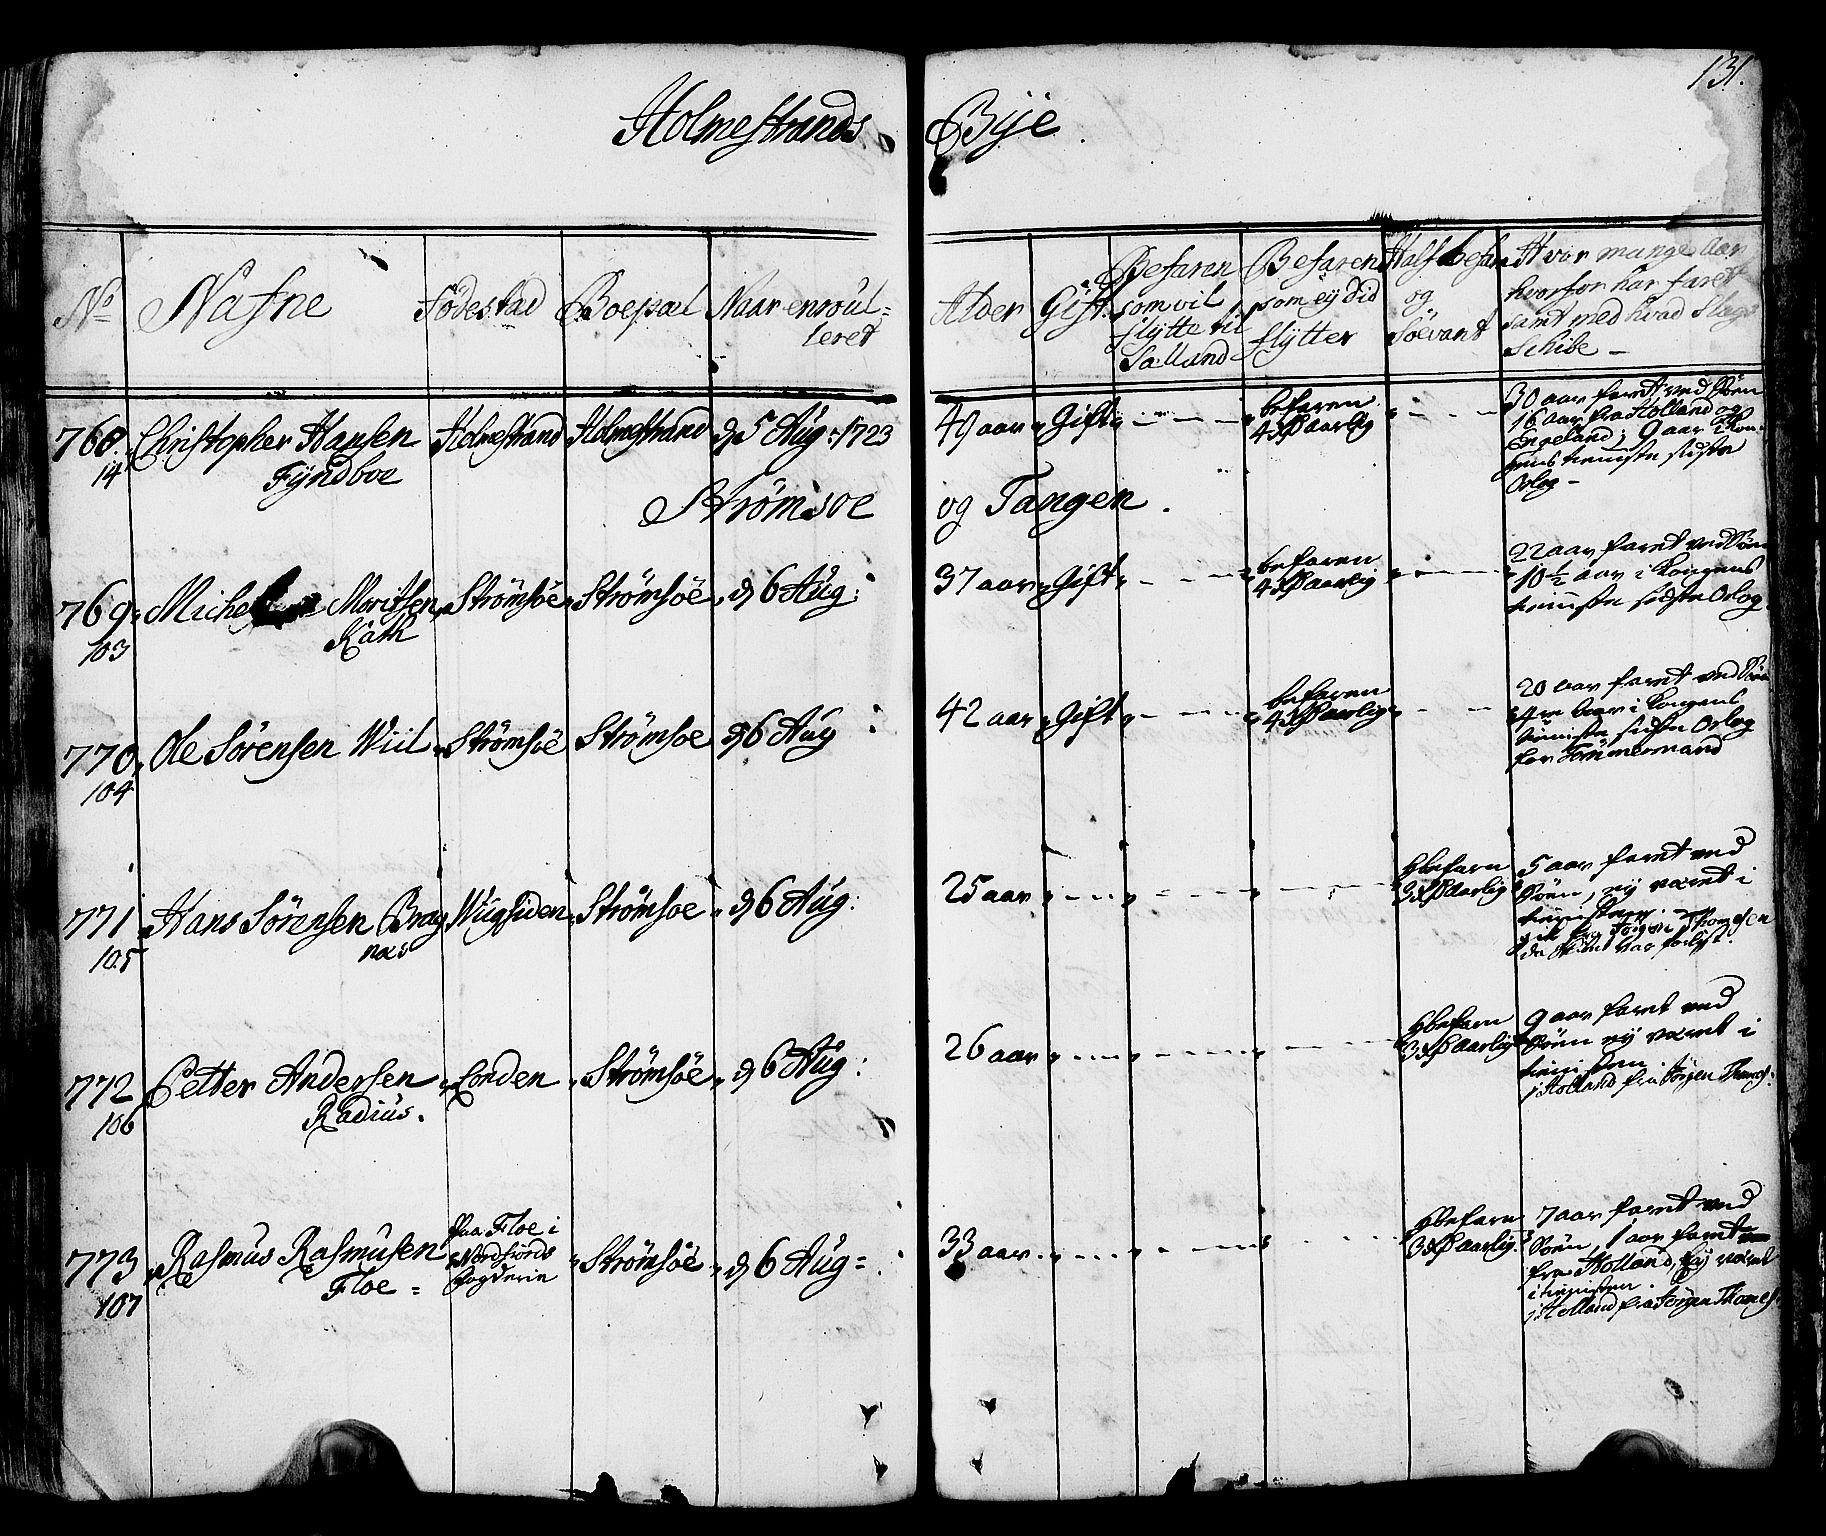 SAKO, Drammen innrulleringsdistrikt, F/Fa/L0002: Hovedrulle, 1723-1726, p. 132